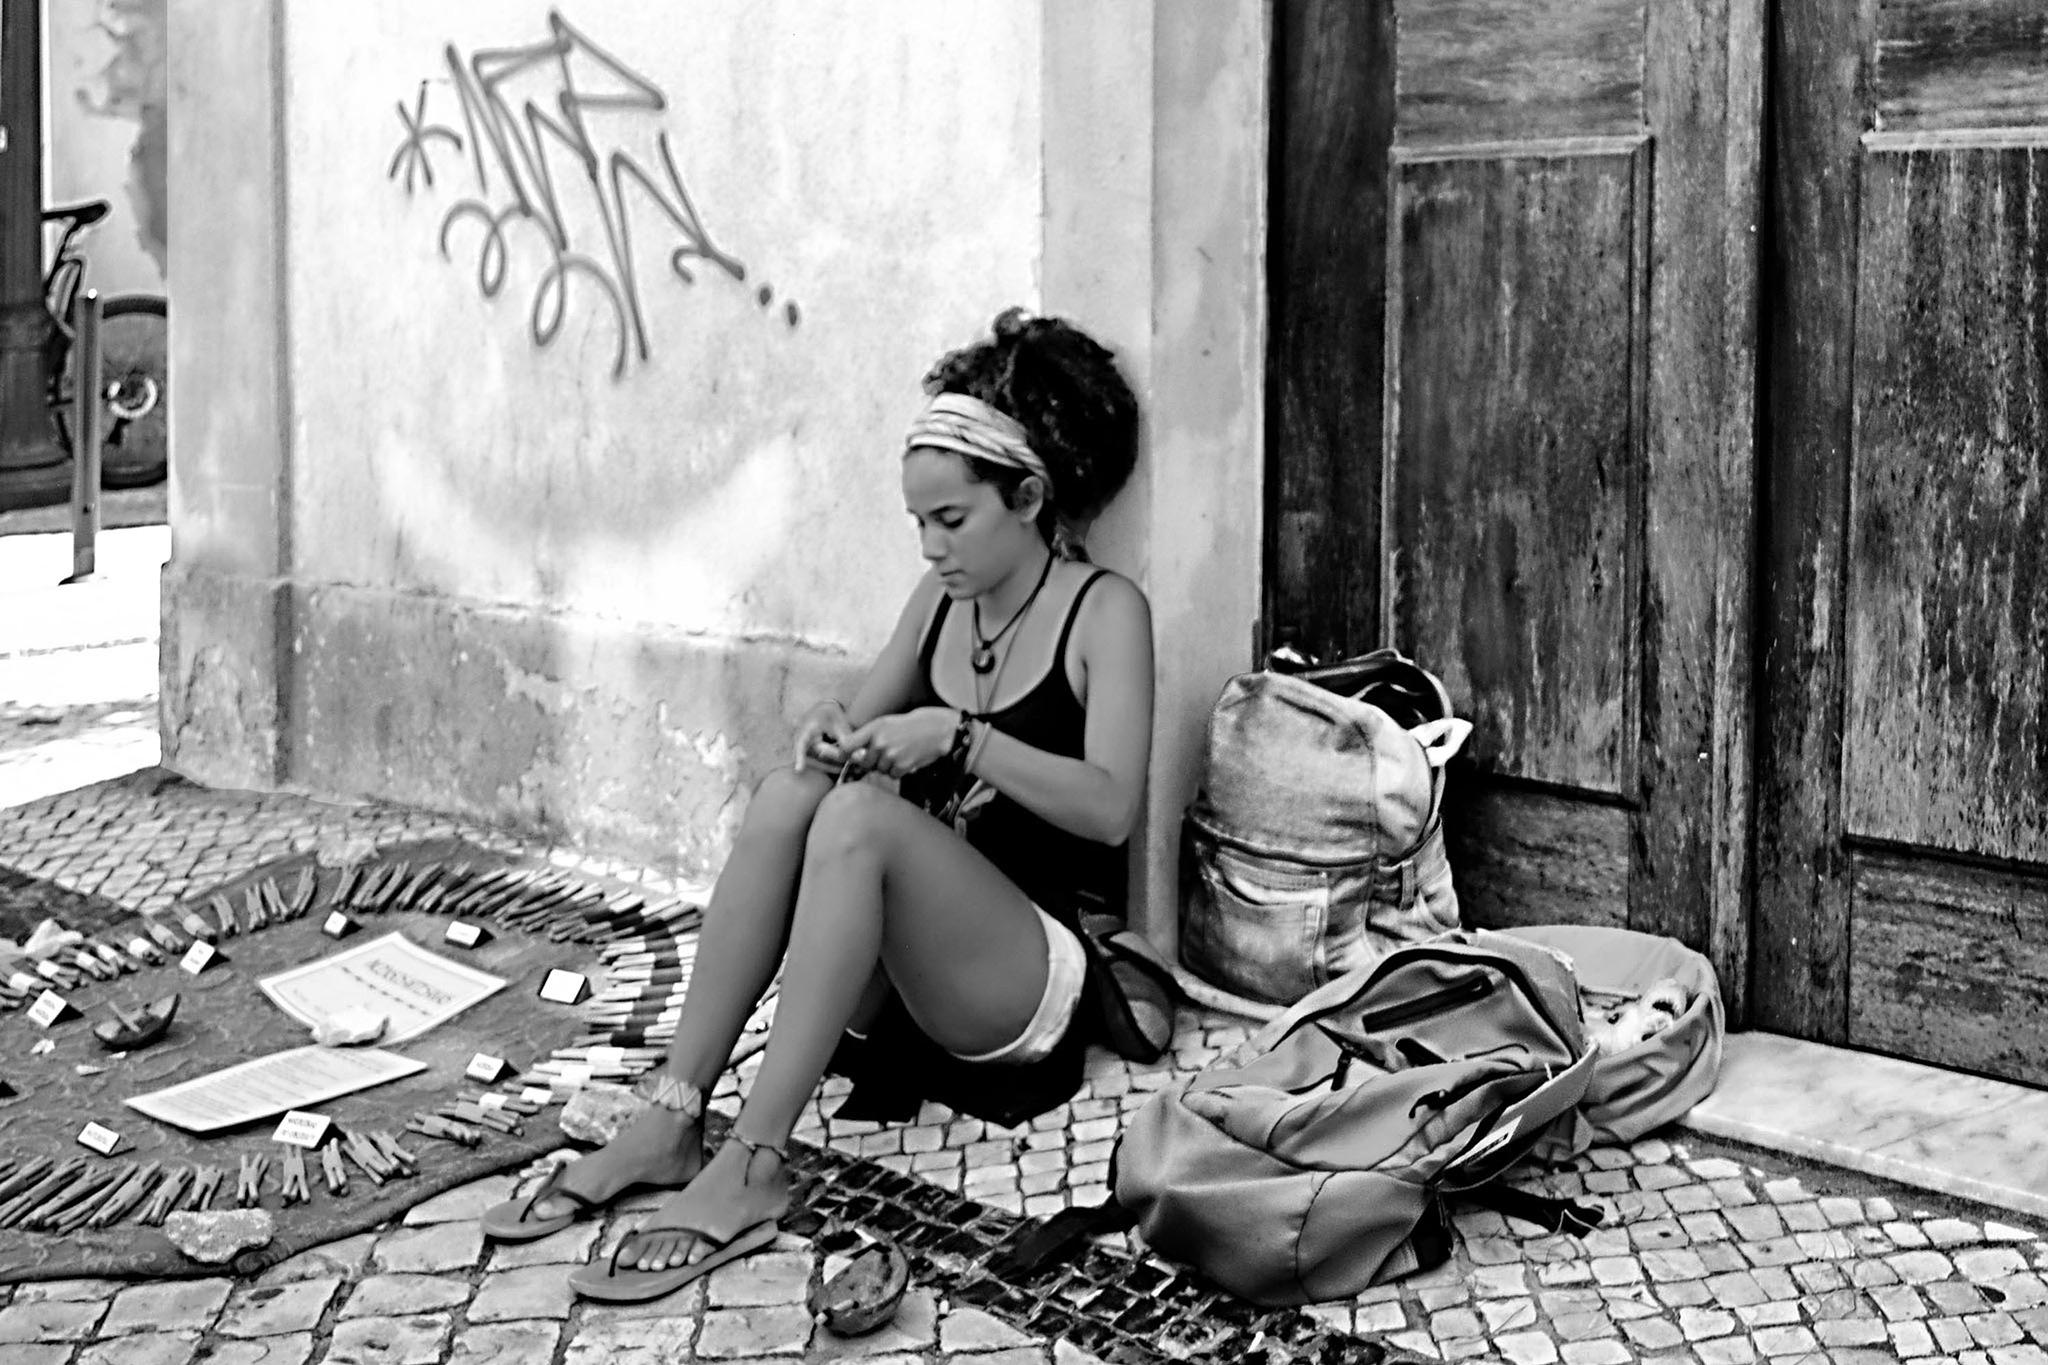 Urban by Cristina MSoler